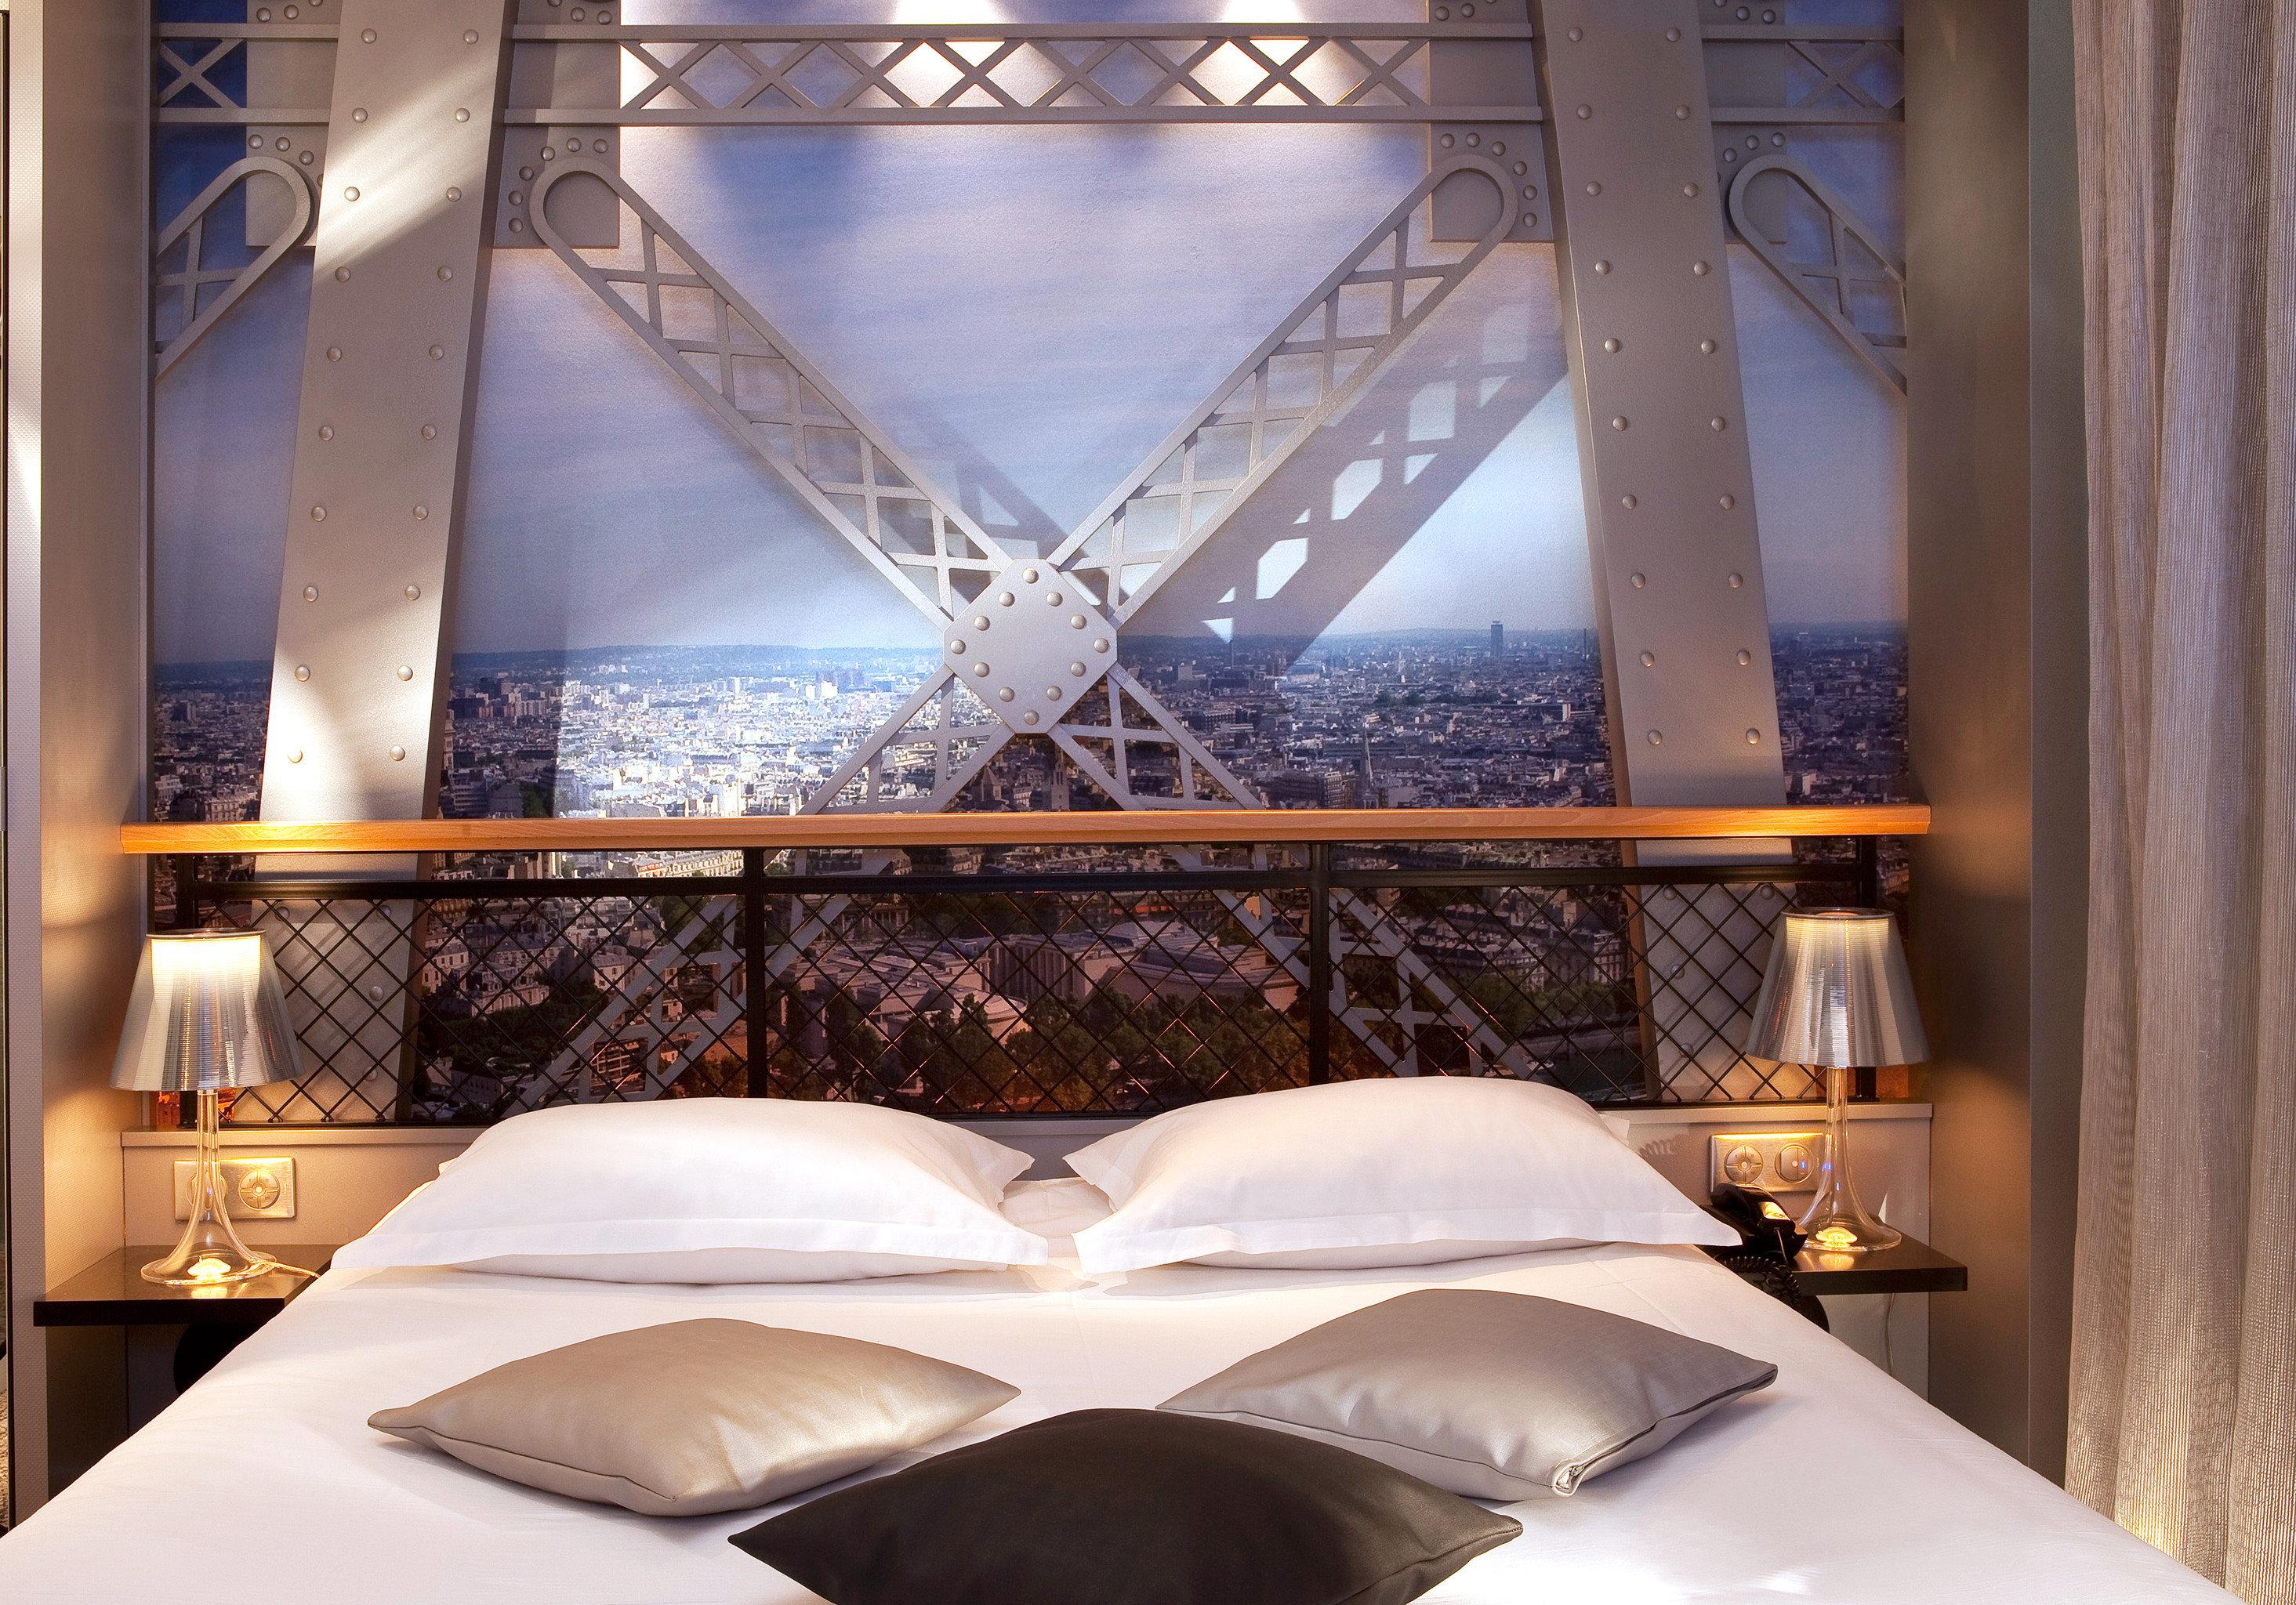 Bedroom Hip Romance Romantic white pillow